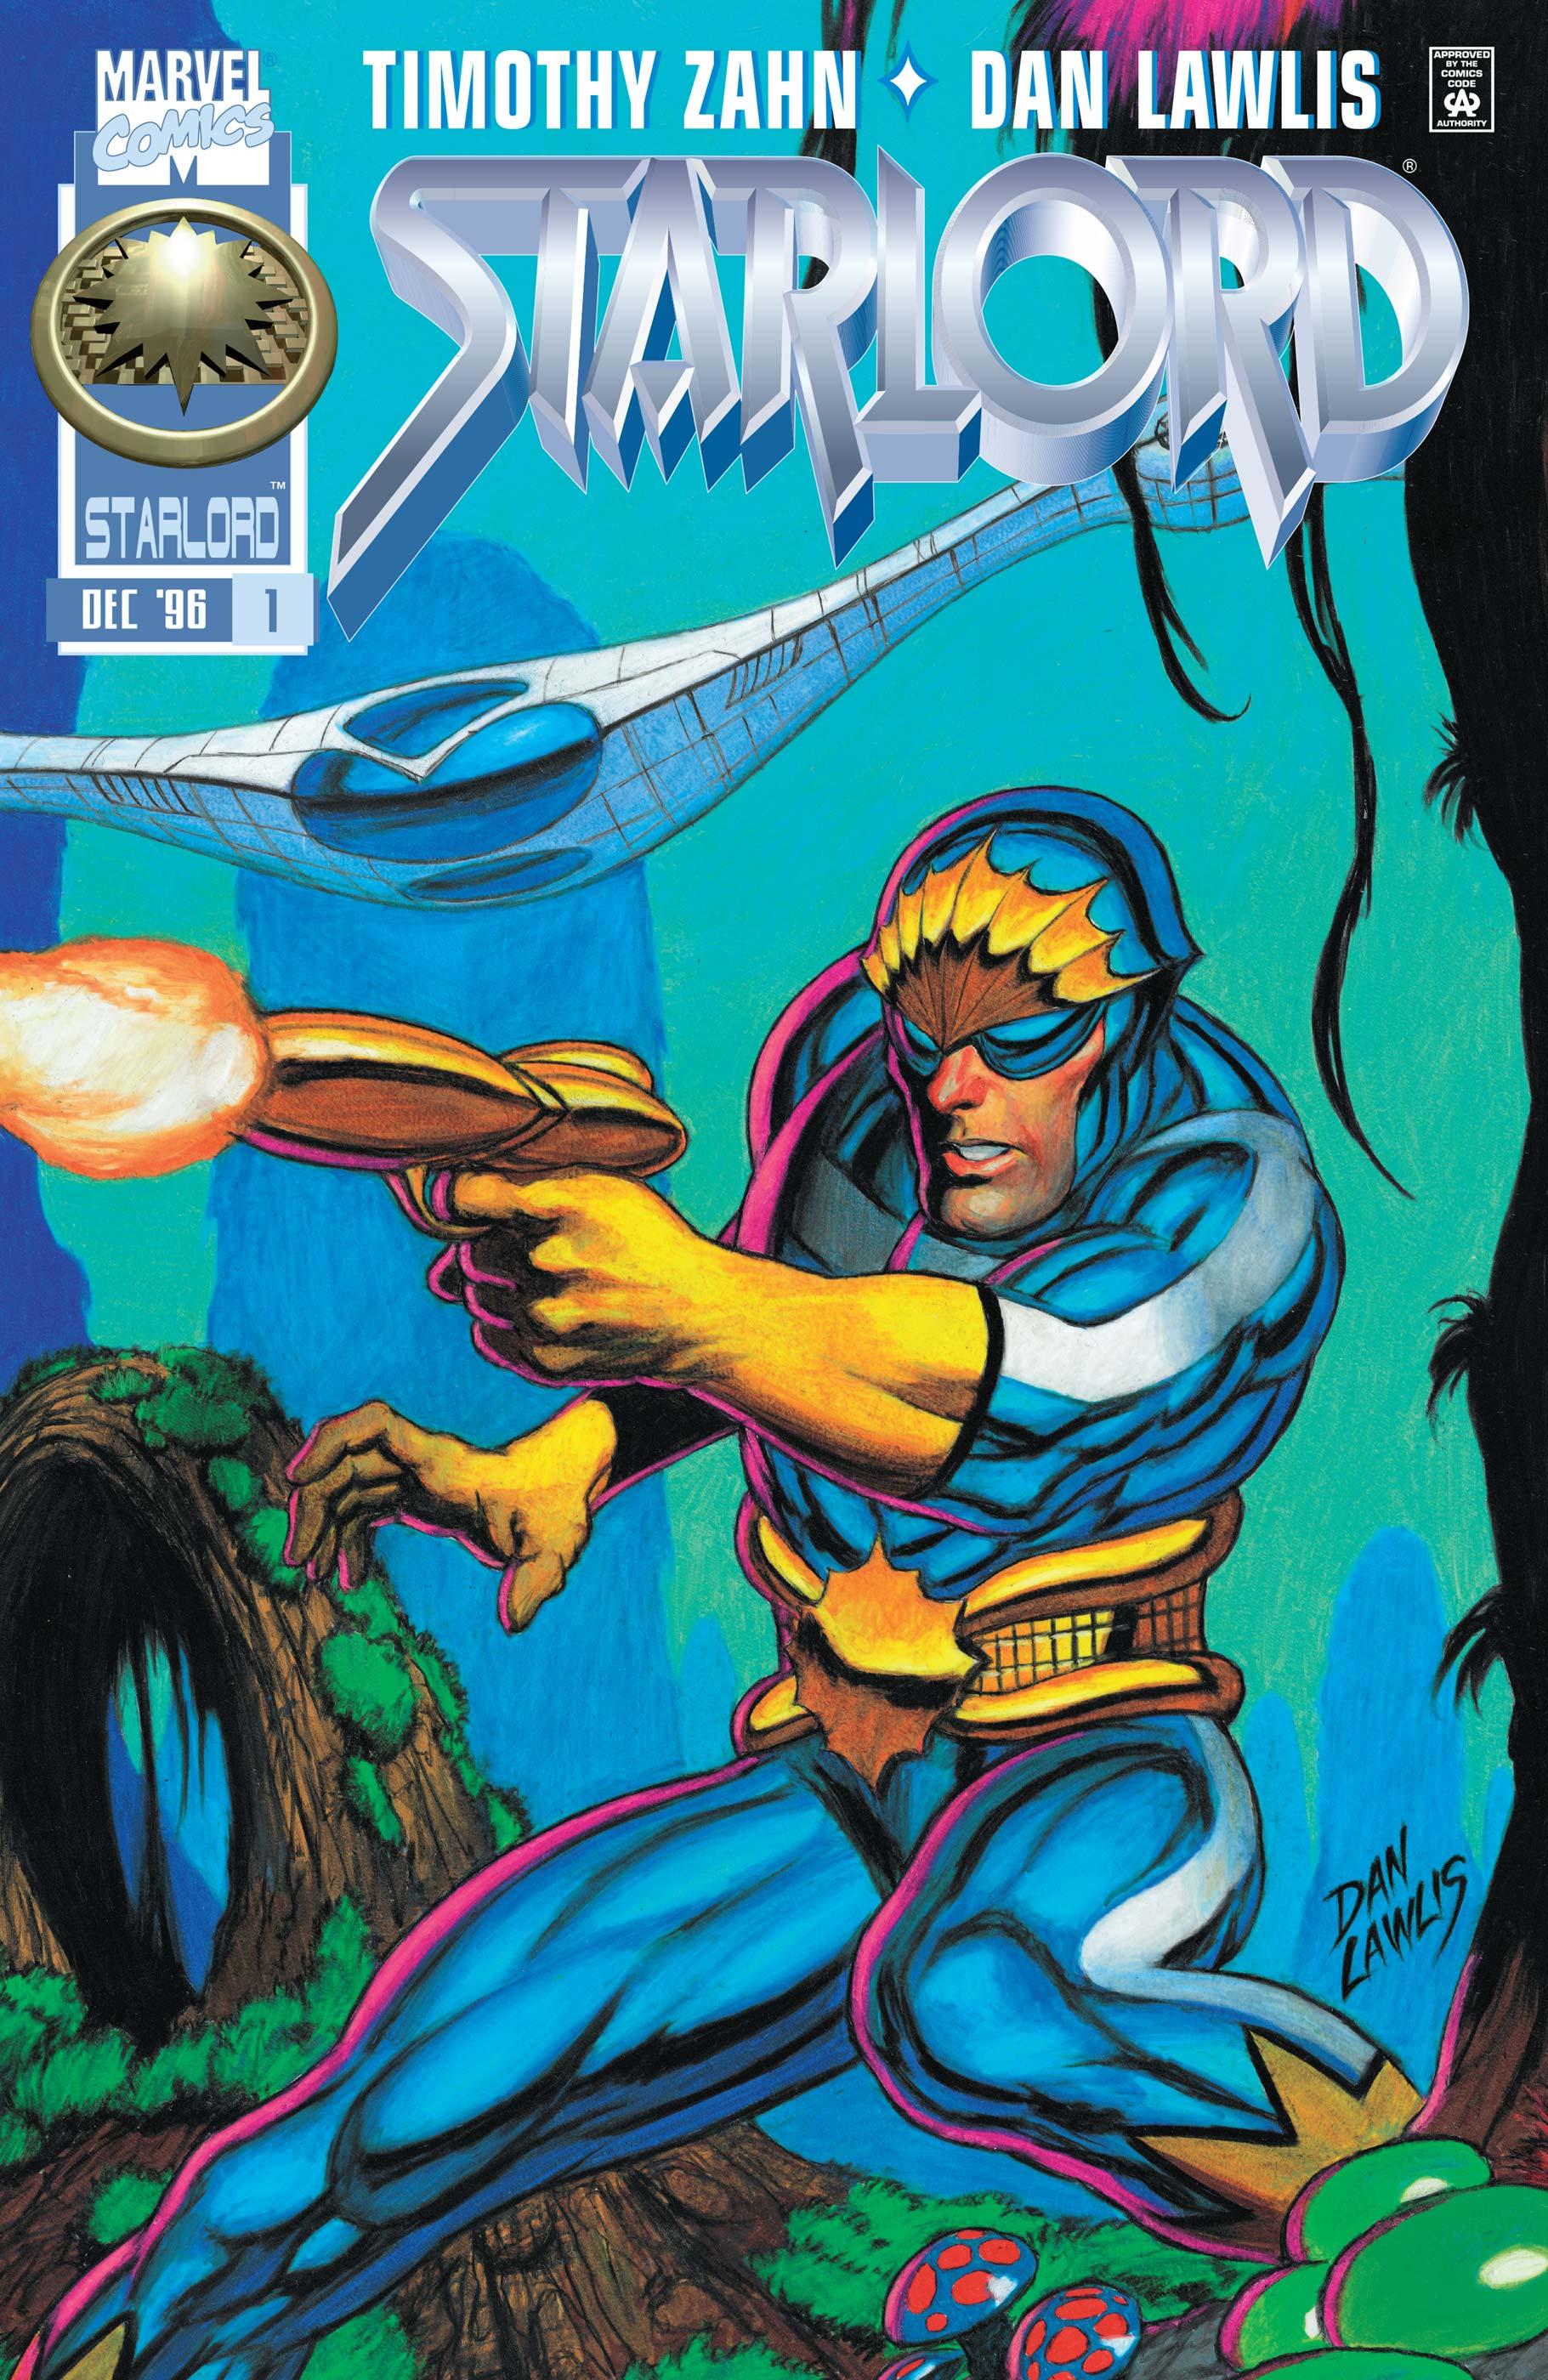 Starlord (1996) #1